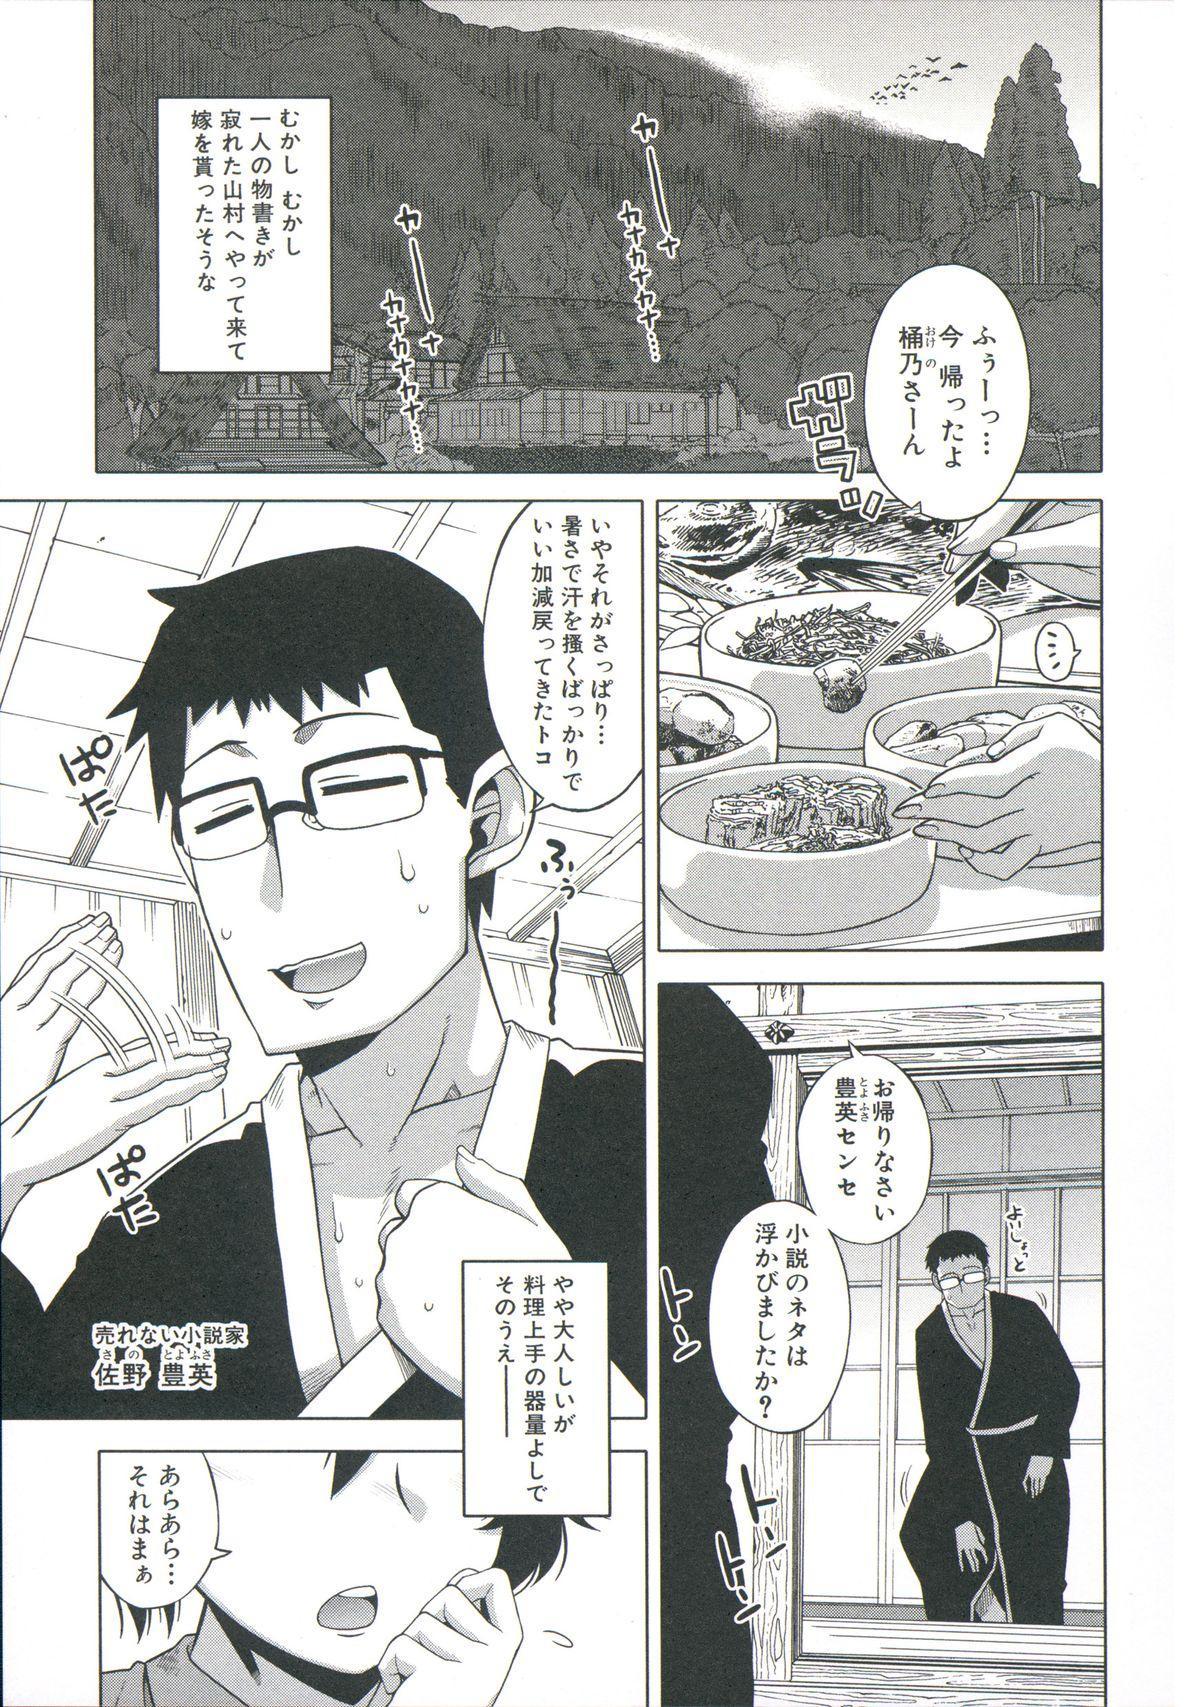 [Takatsu] Ou-sama Appli - King App 169